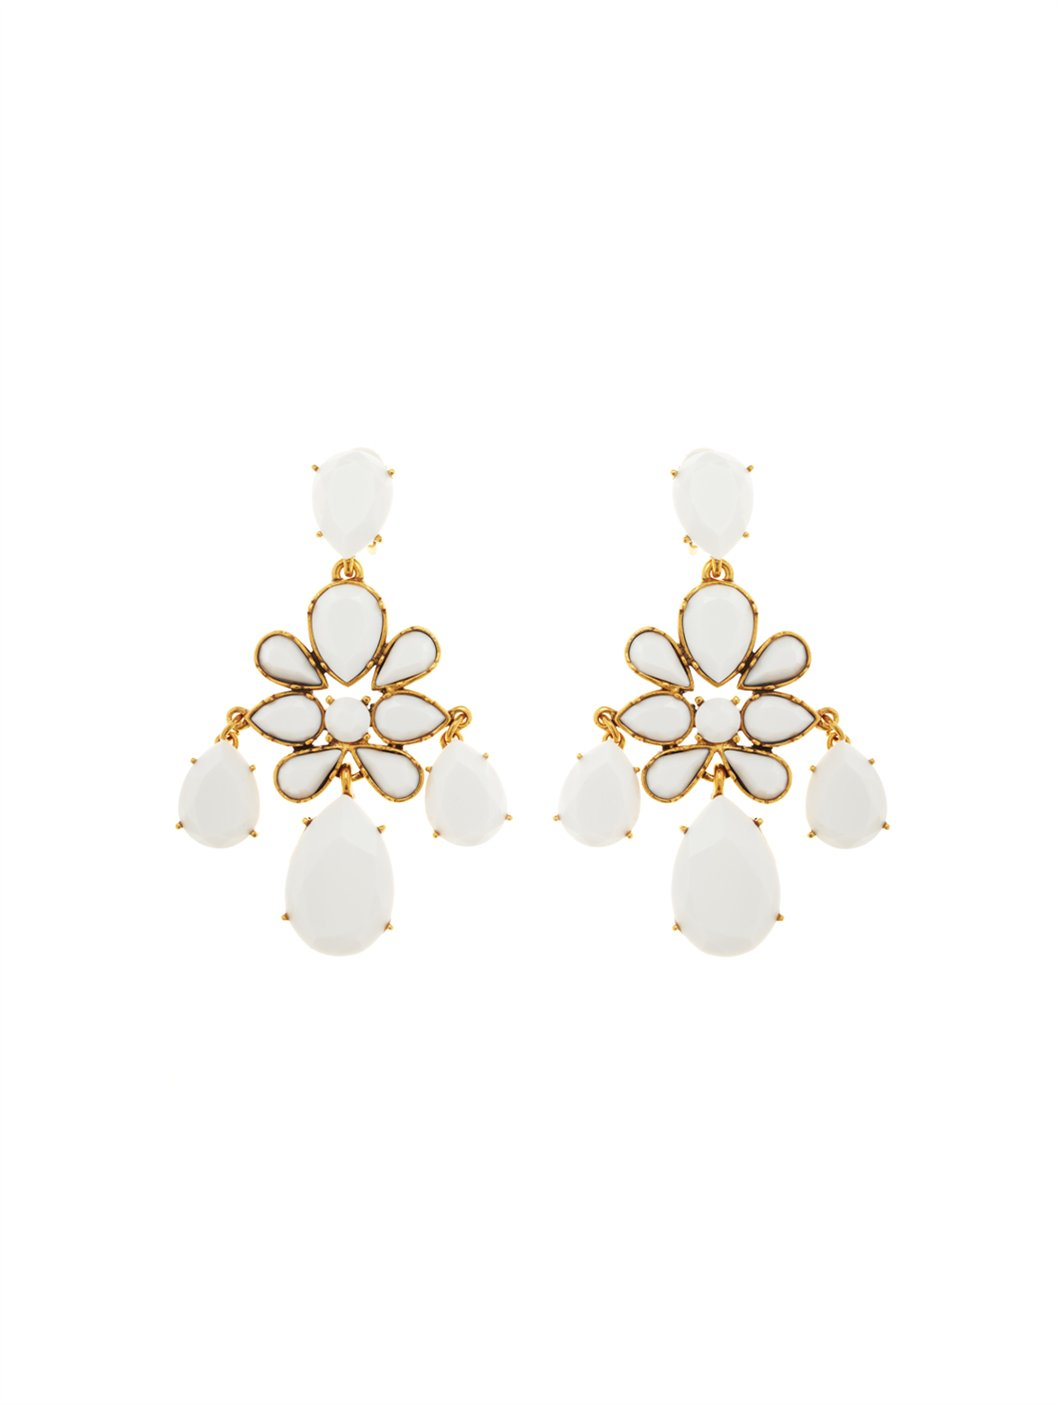 Oscar de la renta iconic chandelier earring in natural lyst gallery arubaitofo Images